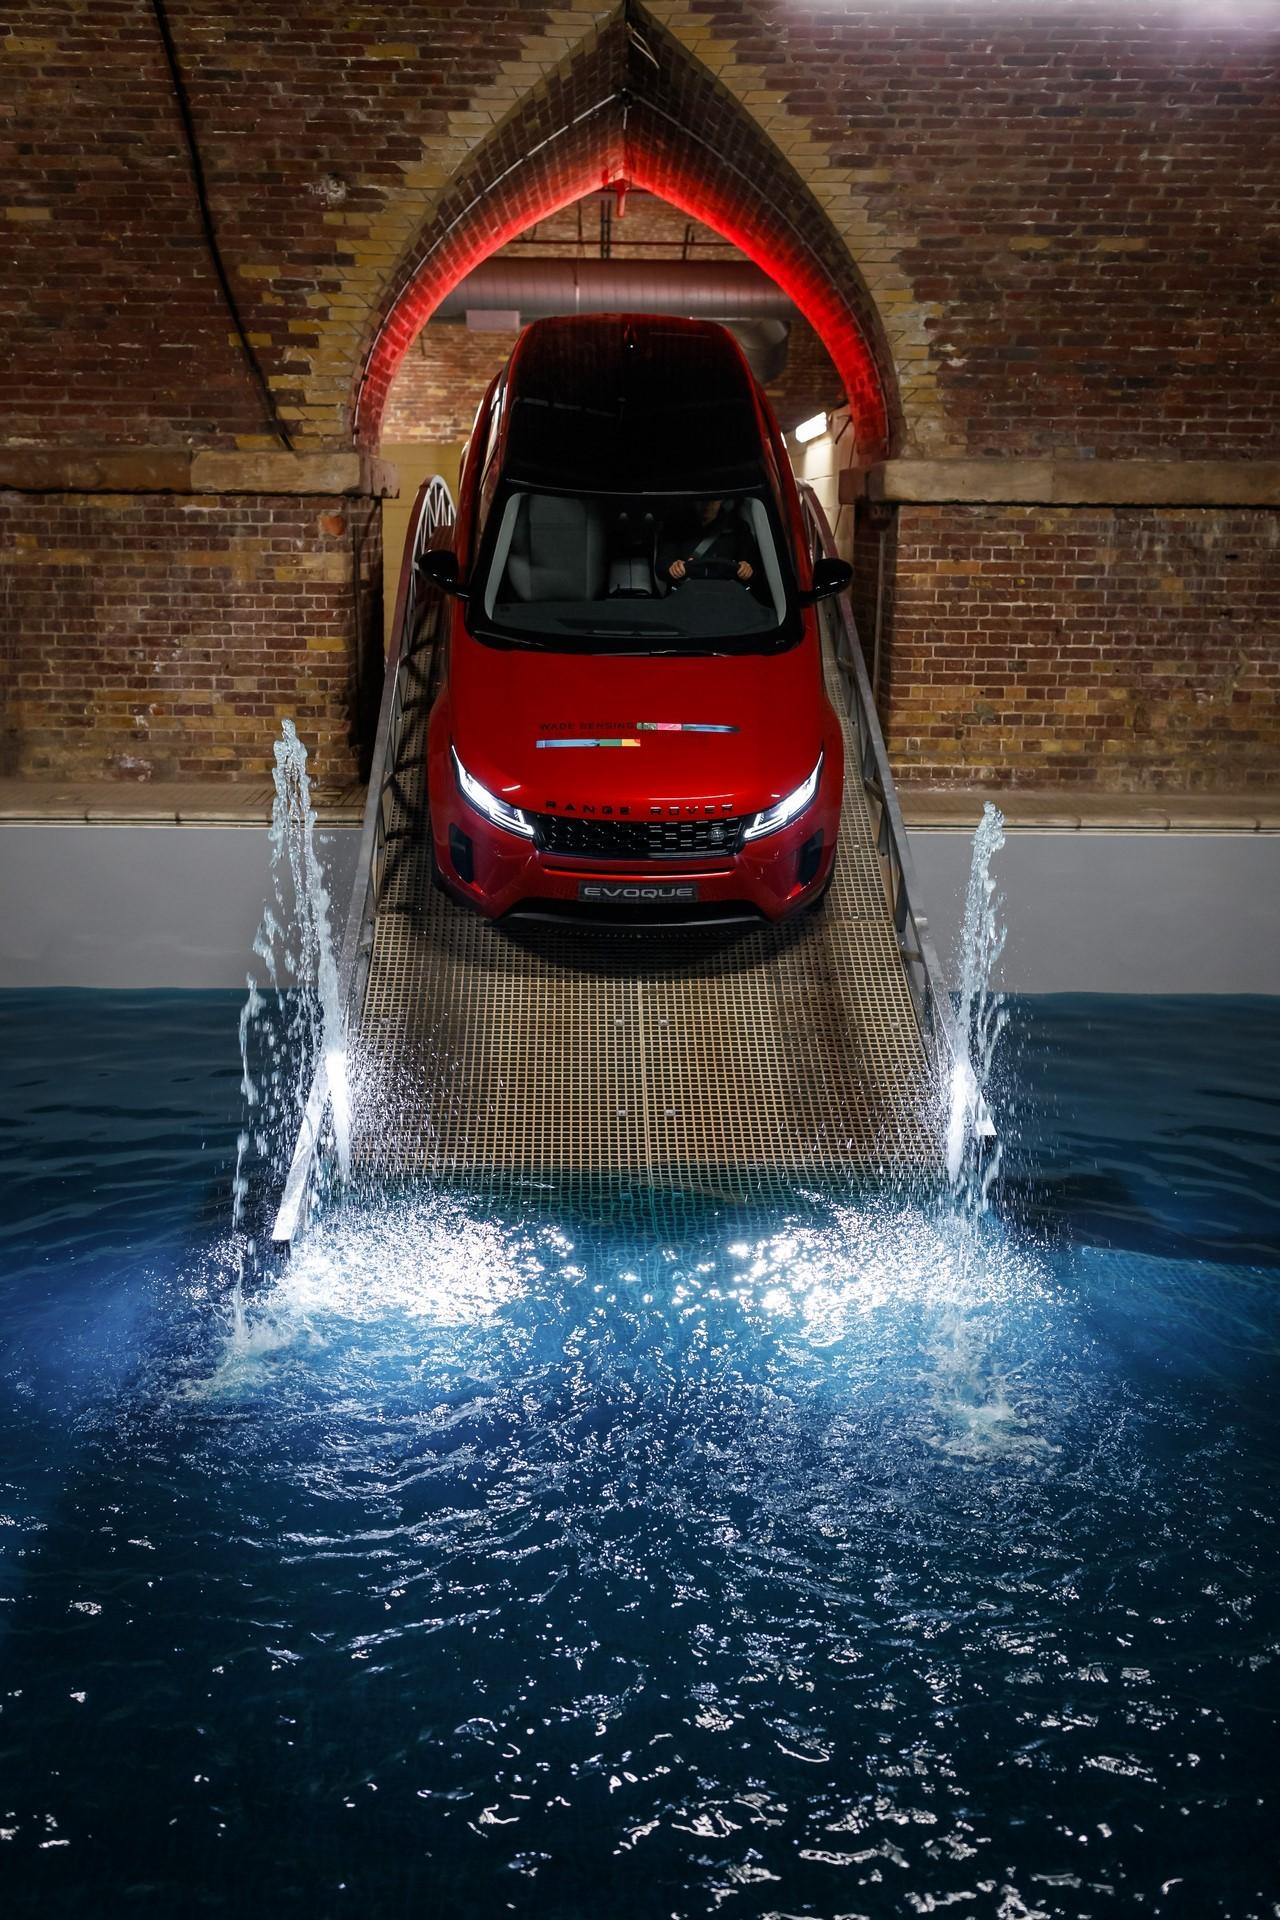 Range Rover Evoque 2019 (127)